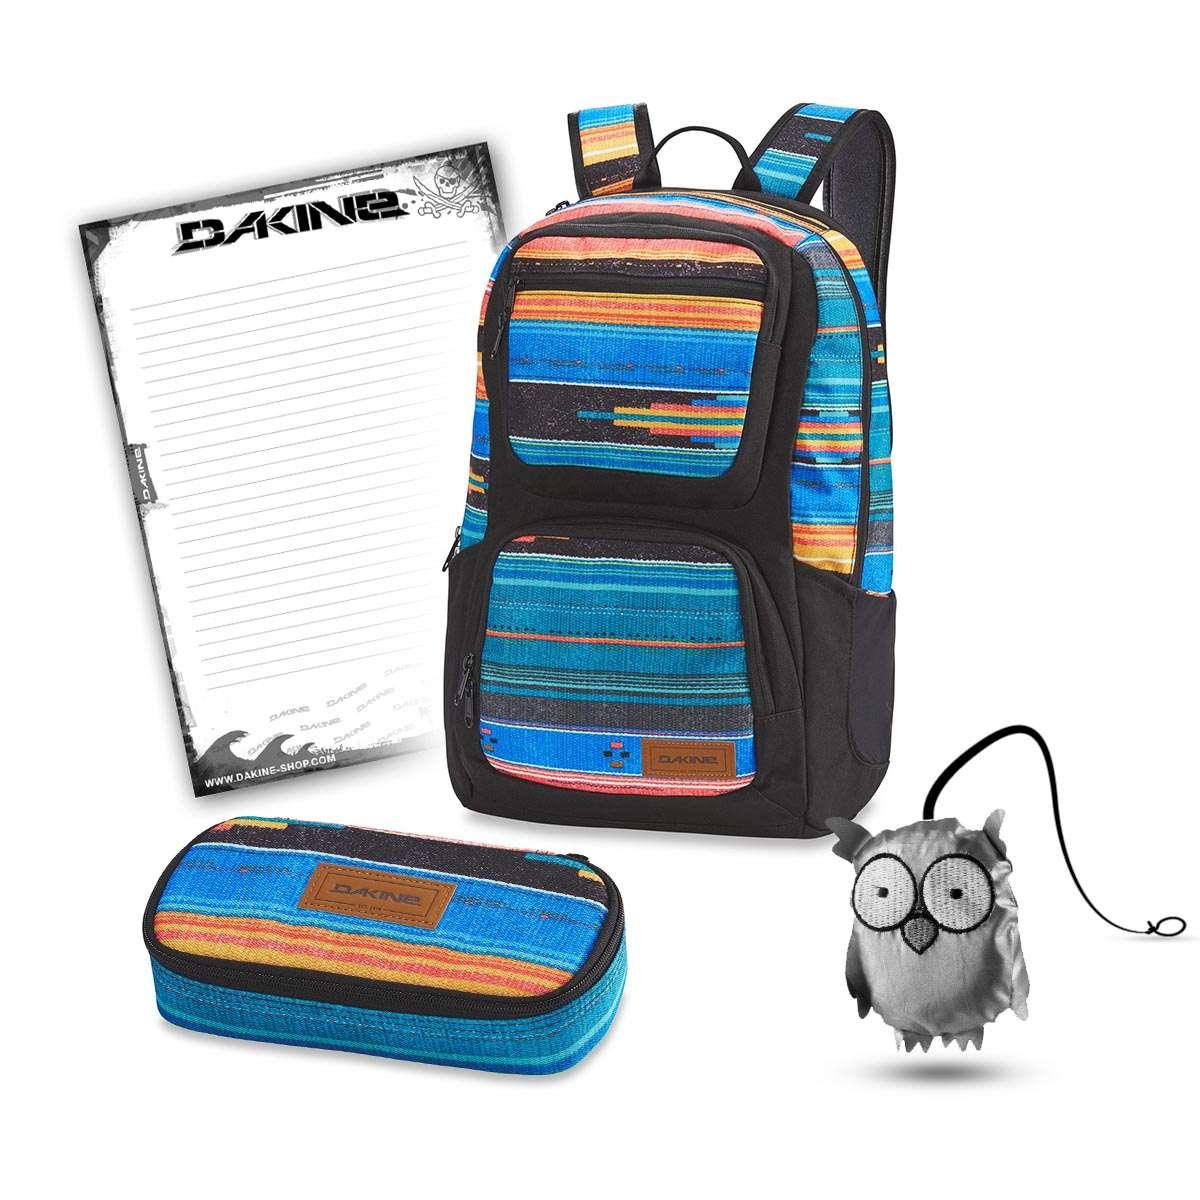 c7ffb8ba1 Dakine Jewel 26L + School Case XL + Emma + Notepad School Set Baja Sunset |  School Sets | School | DAKINE Shop.de: Dakine-Rucksack, Dakine-Taschen, ...